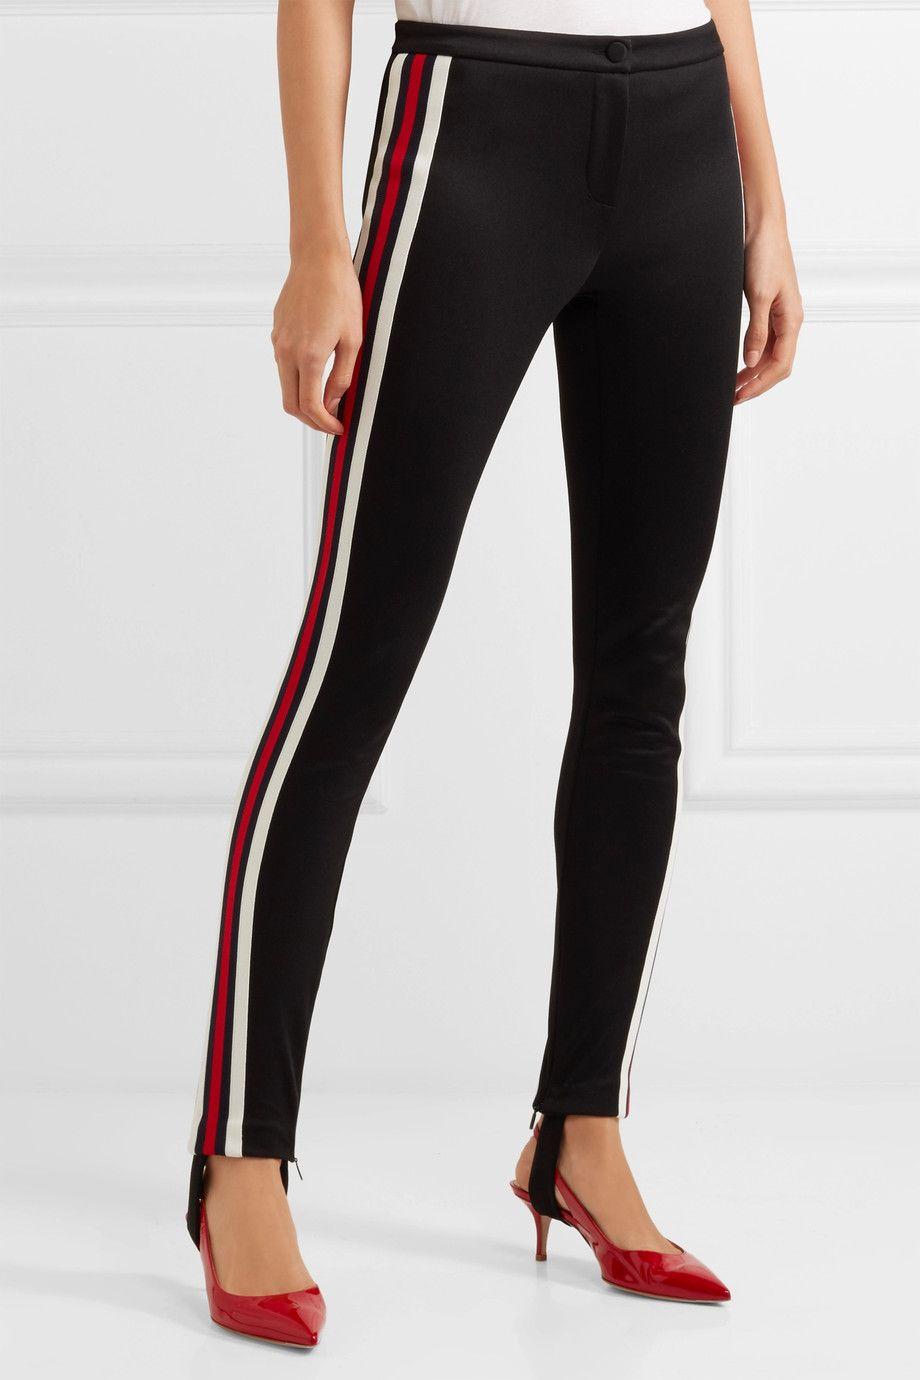 3deeb94d62c530 Gucci - Striped tech-jersey stirrup leggings | Inspiration | Stirrup ...